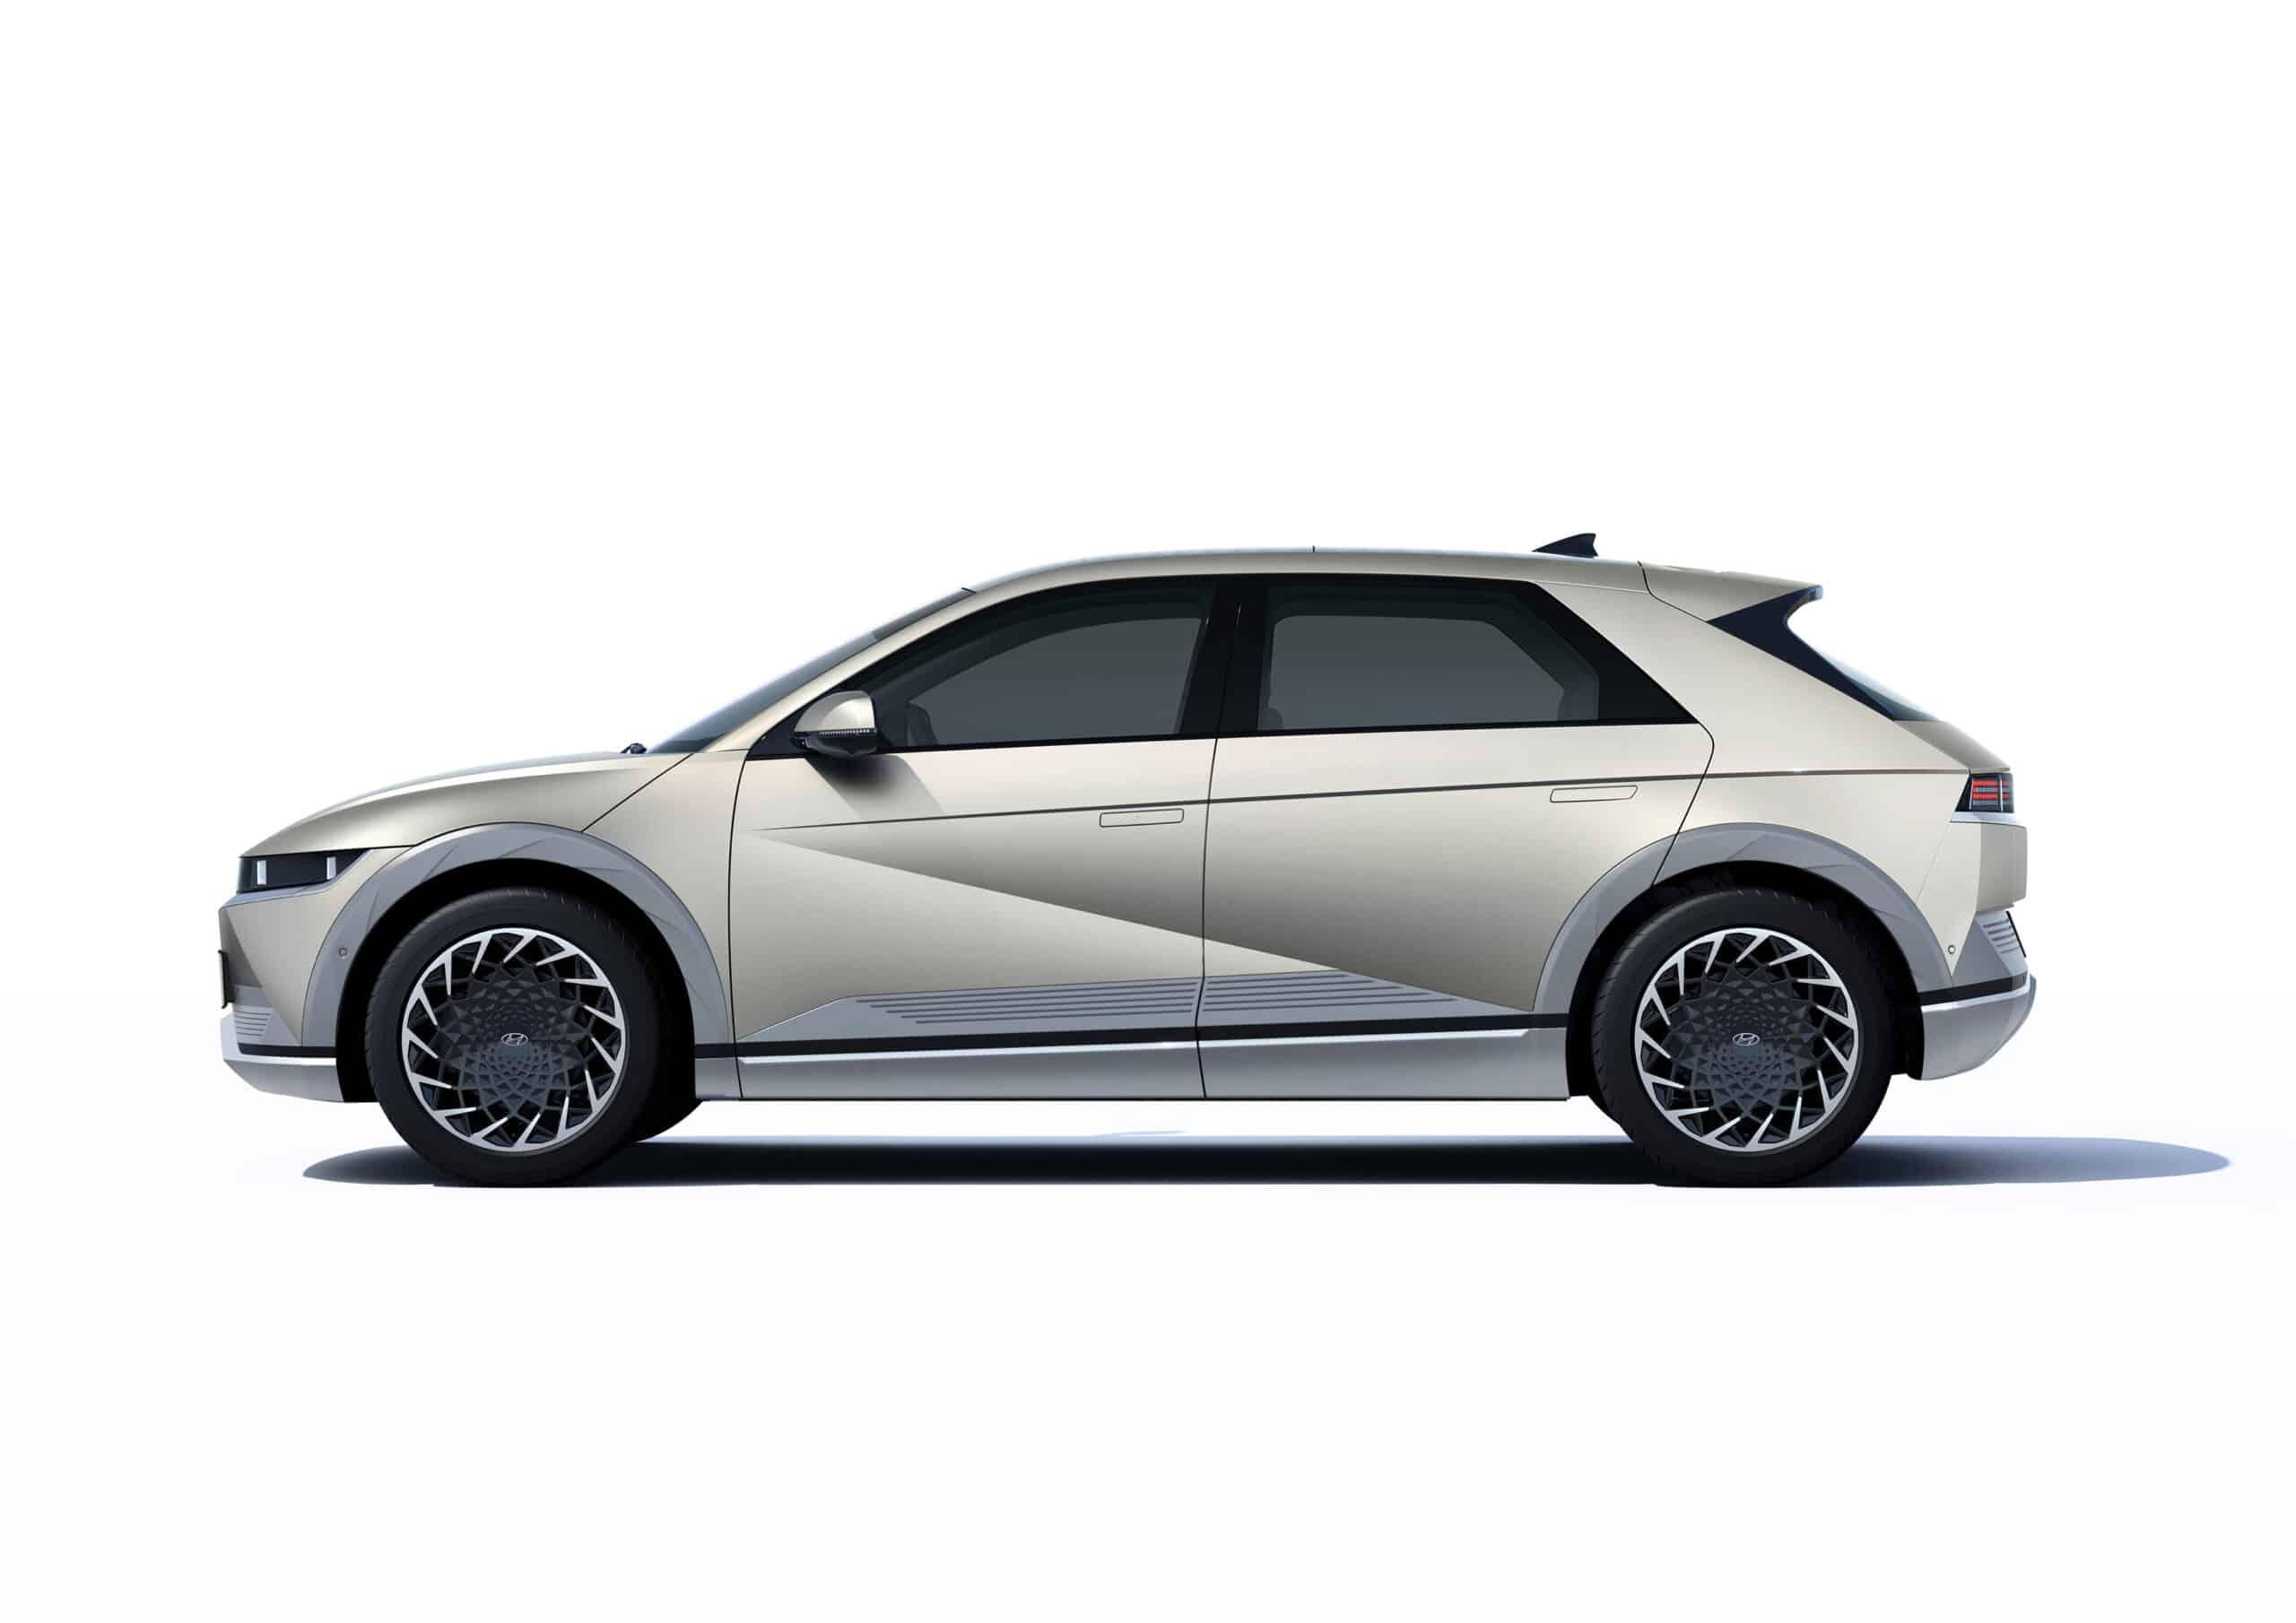 Preise des neuen Hyundai Ioniq beginnen bei 41.900 Euro